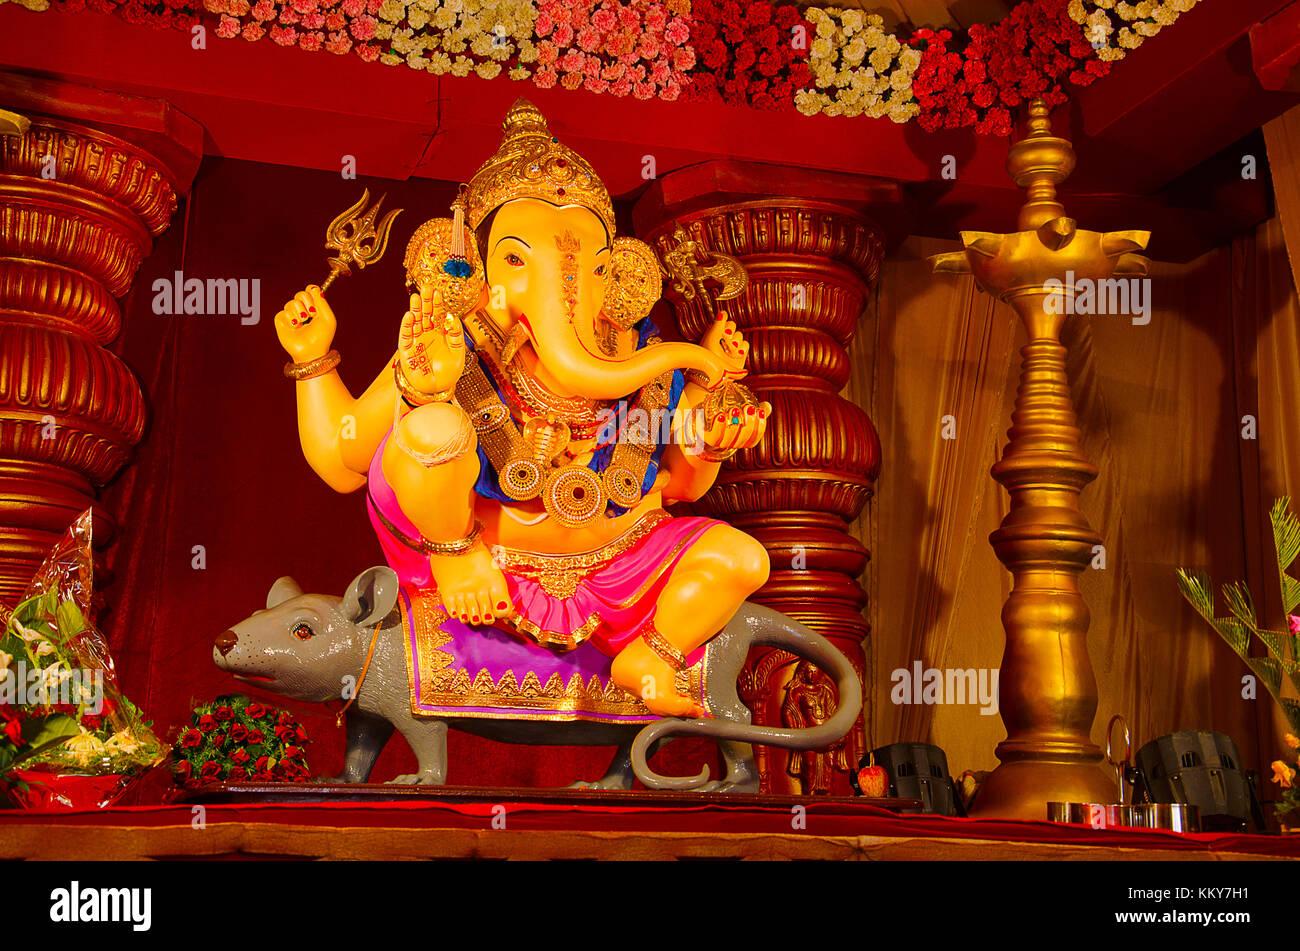 An Idol Of Lord Ganesha Sitting On His Vehicle